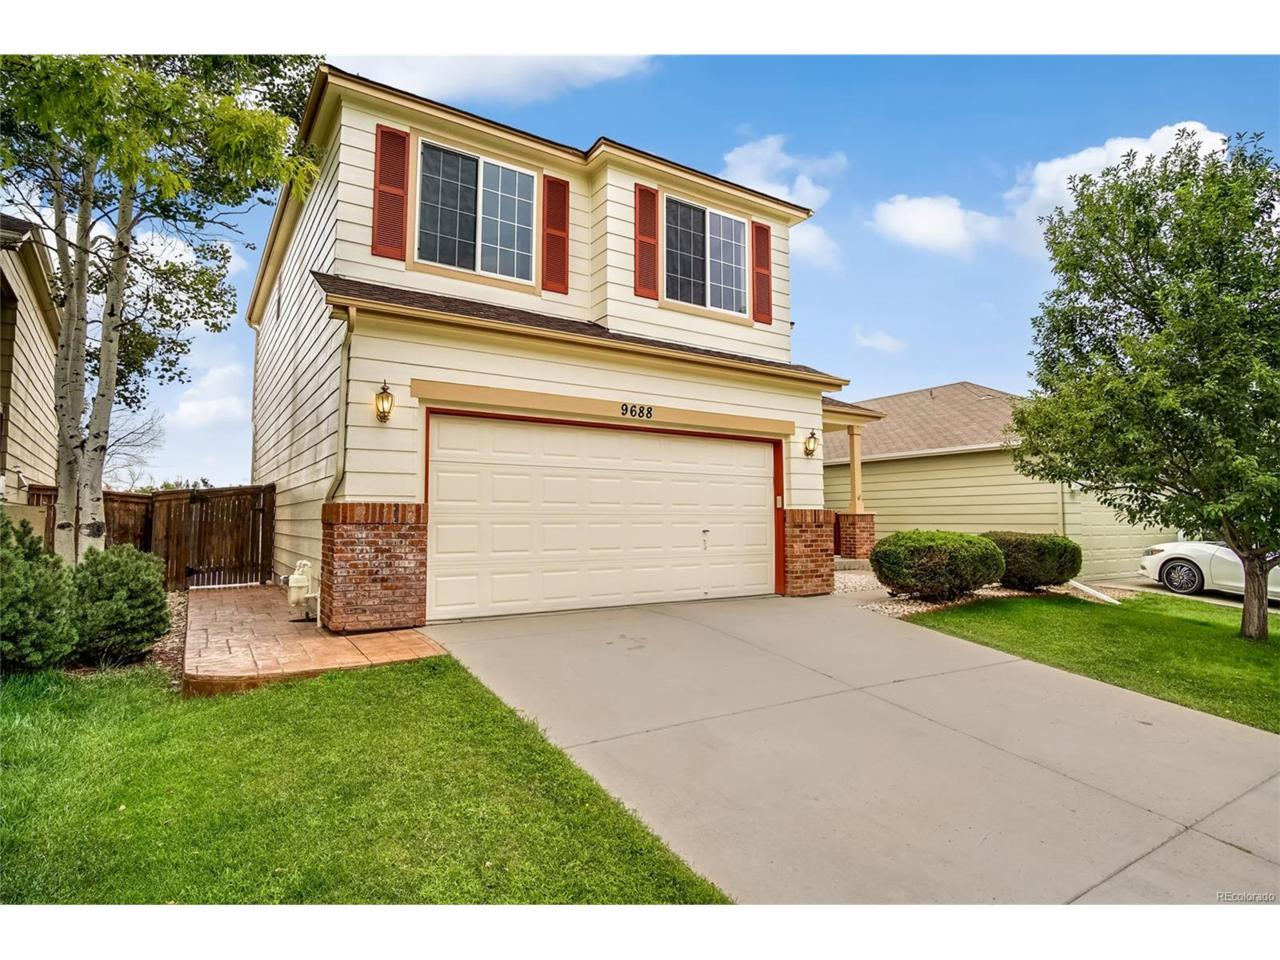 9688 Queenscliffe Drive, Highlands Ranch, CO 80130 (MLS #9706120) :: 8z Real Estate